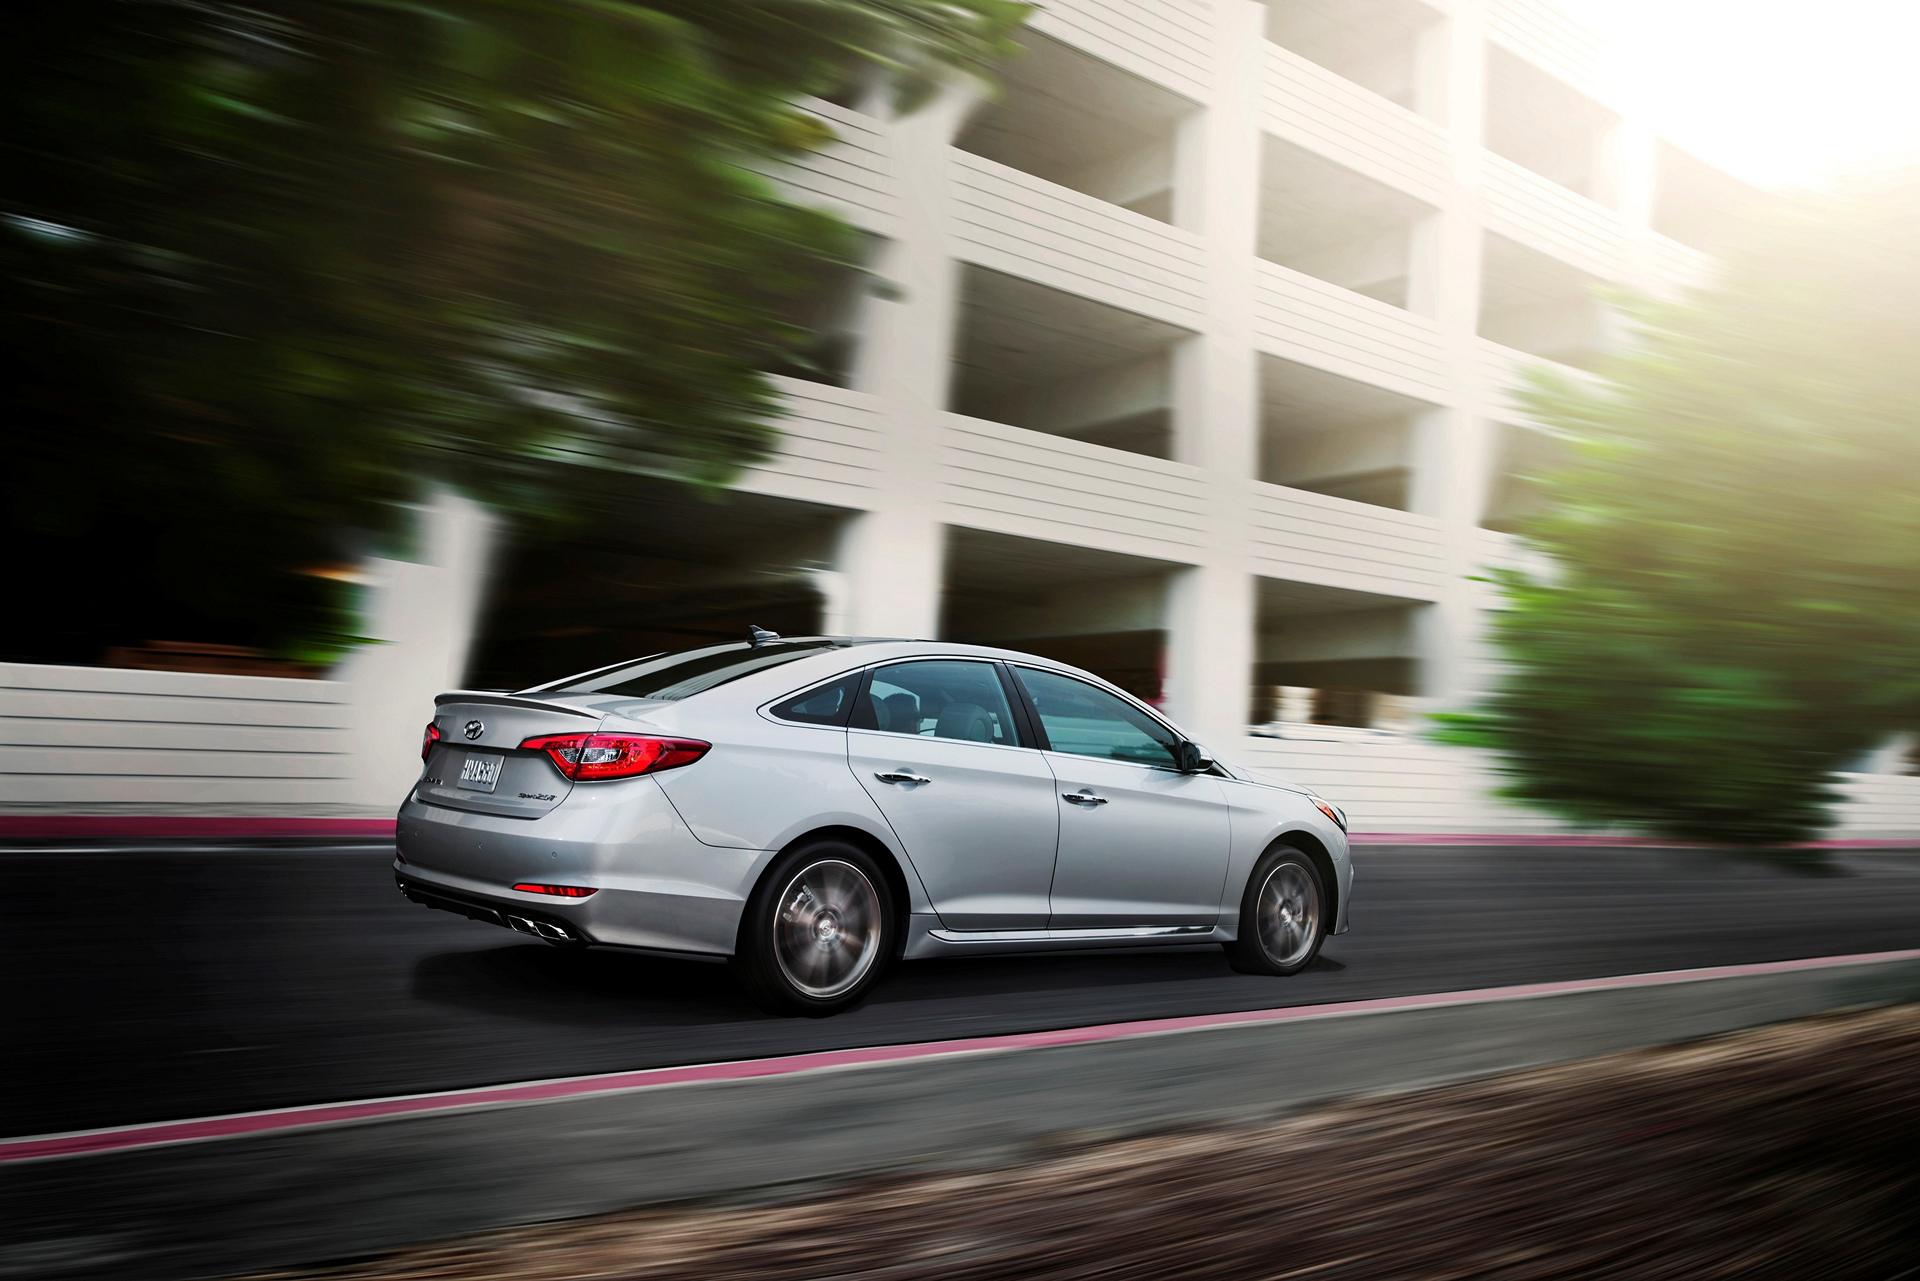 2016 Hyundai Sonata 2.0T © Hyundai Motor Company